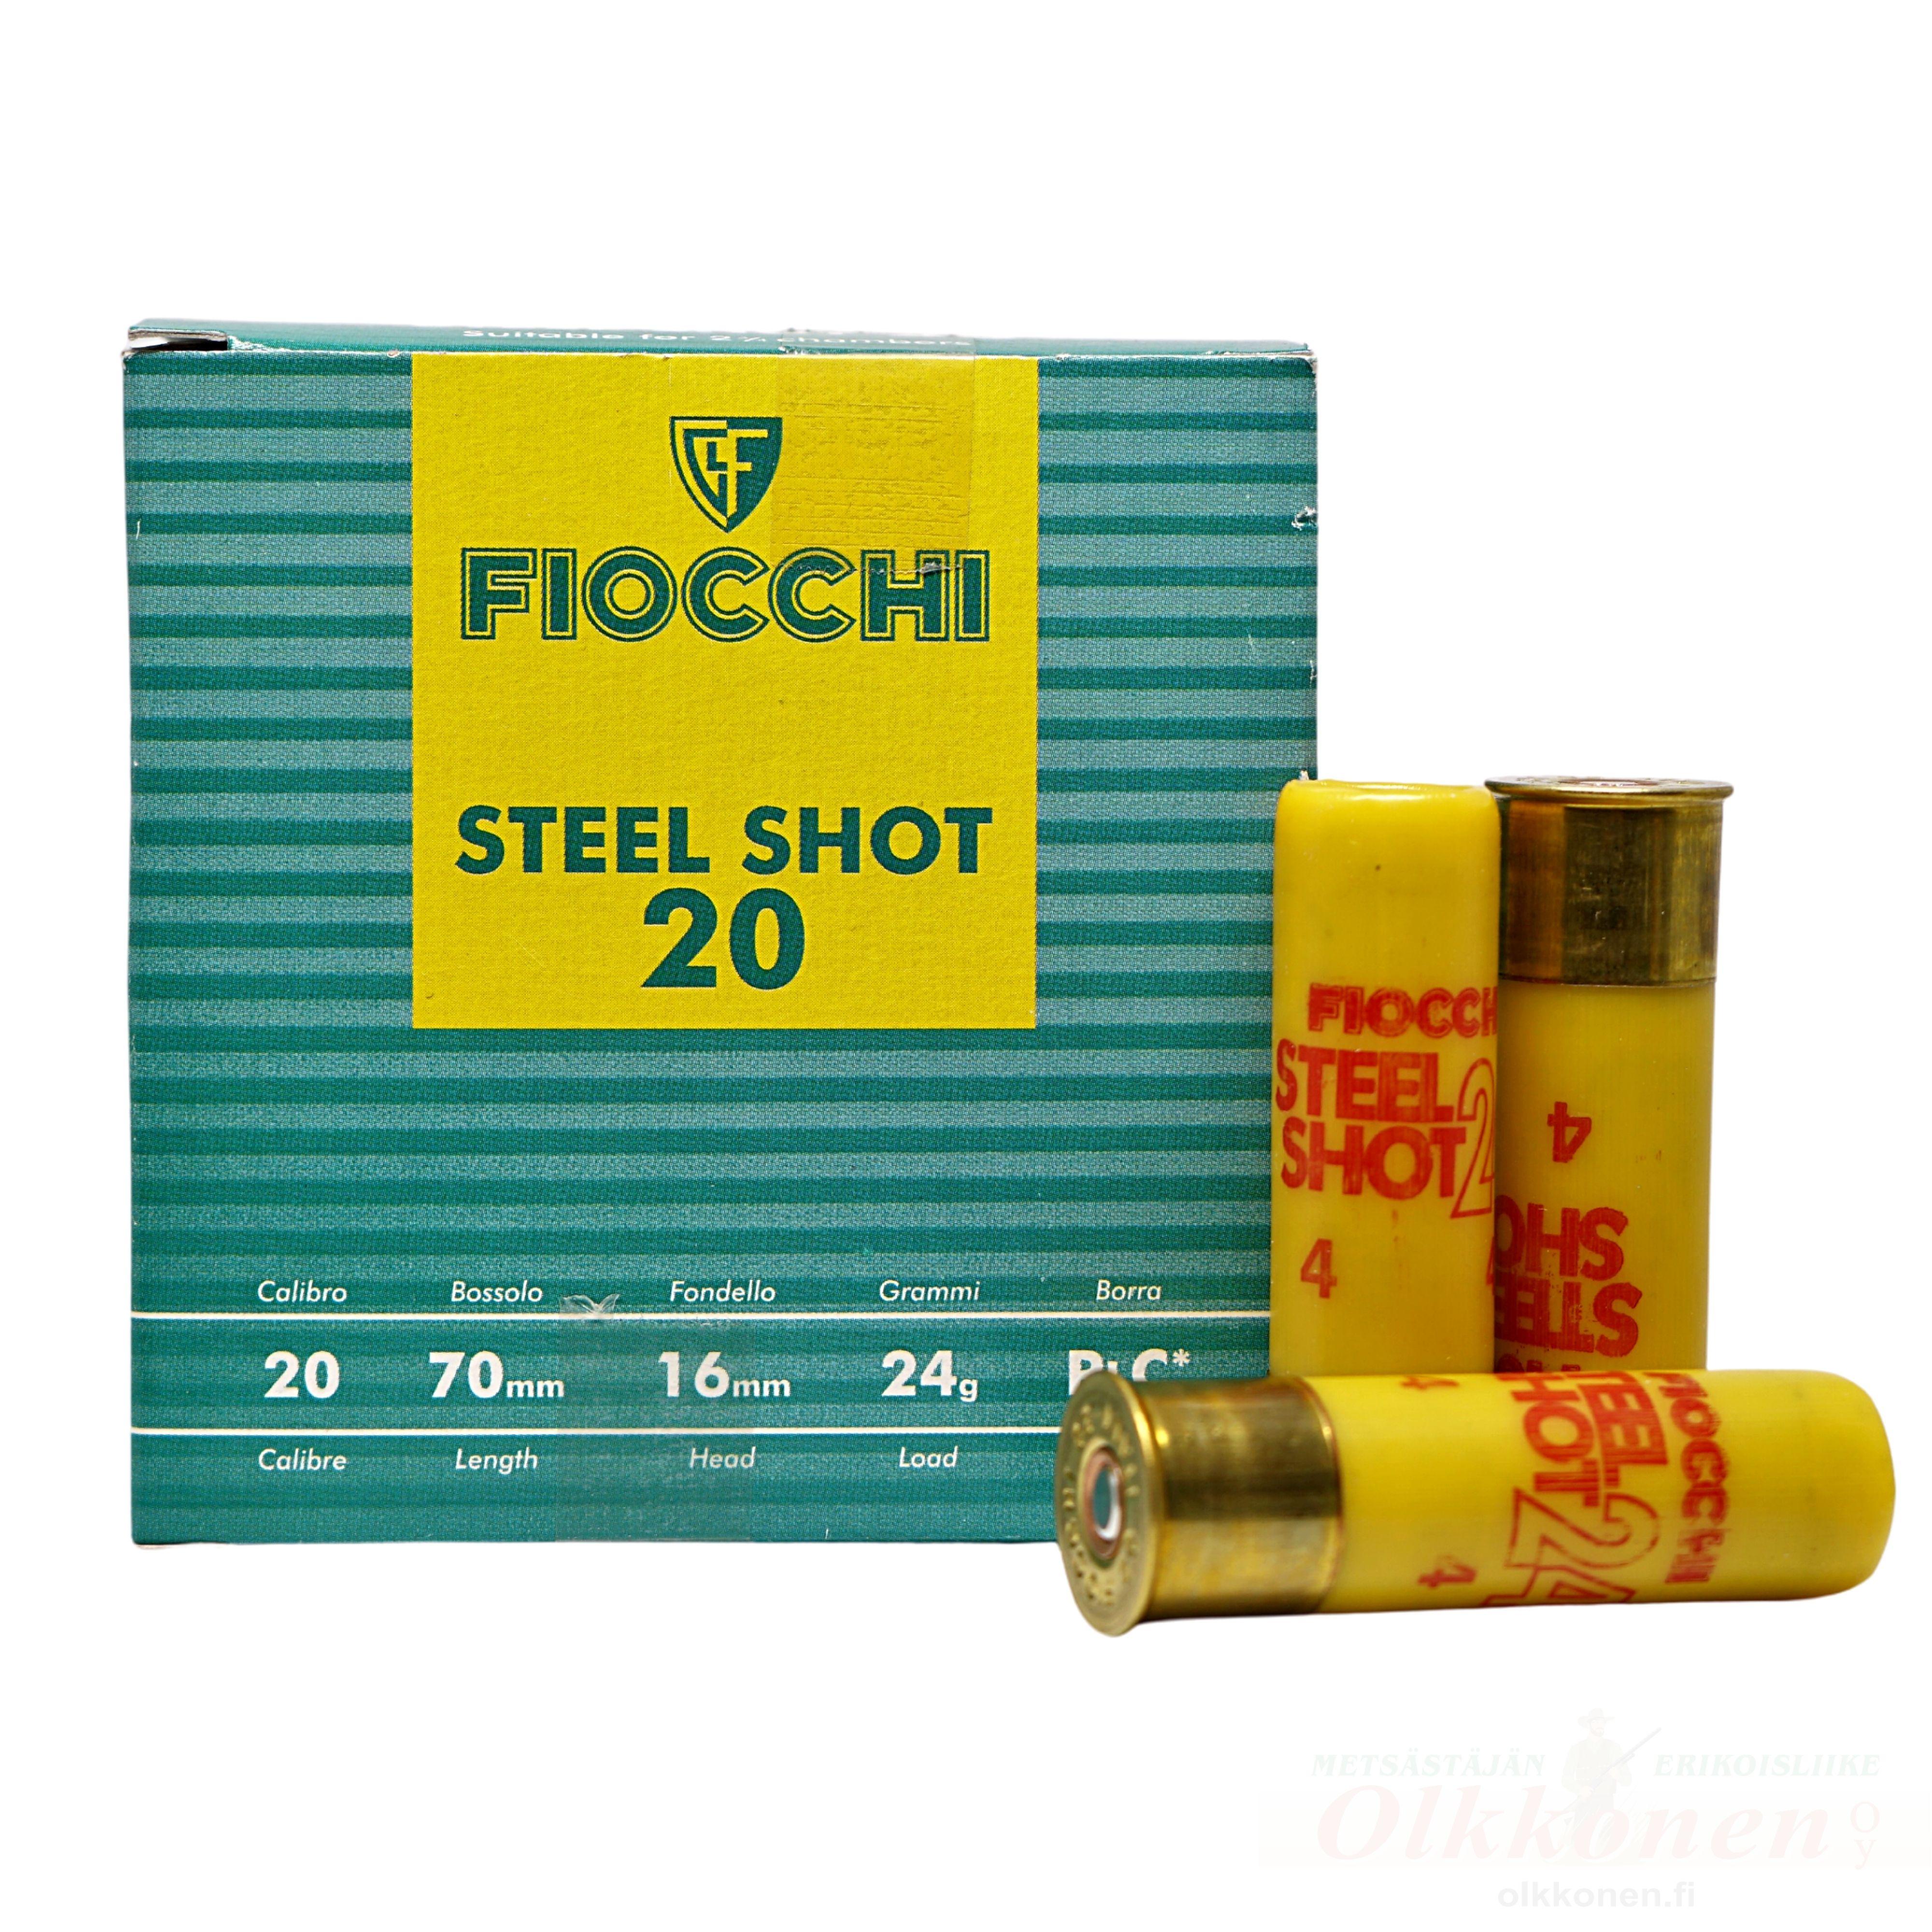 Fiocchi Steel Shot 20 20/70 24g haulikoko 4 25kpl/rs